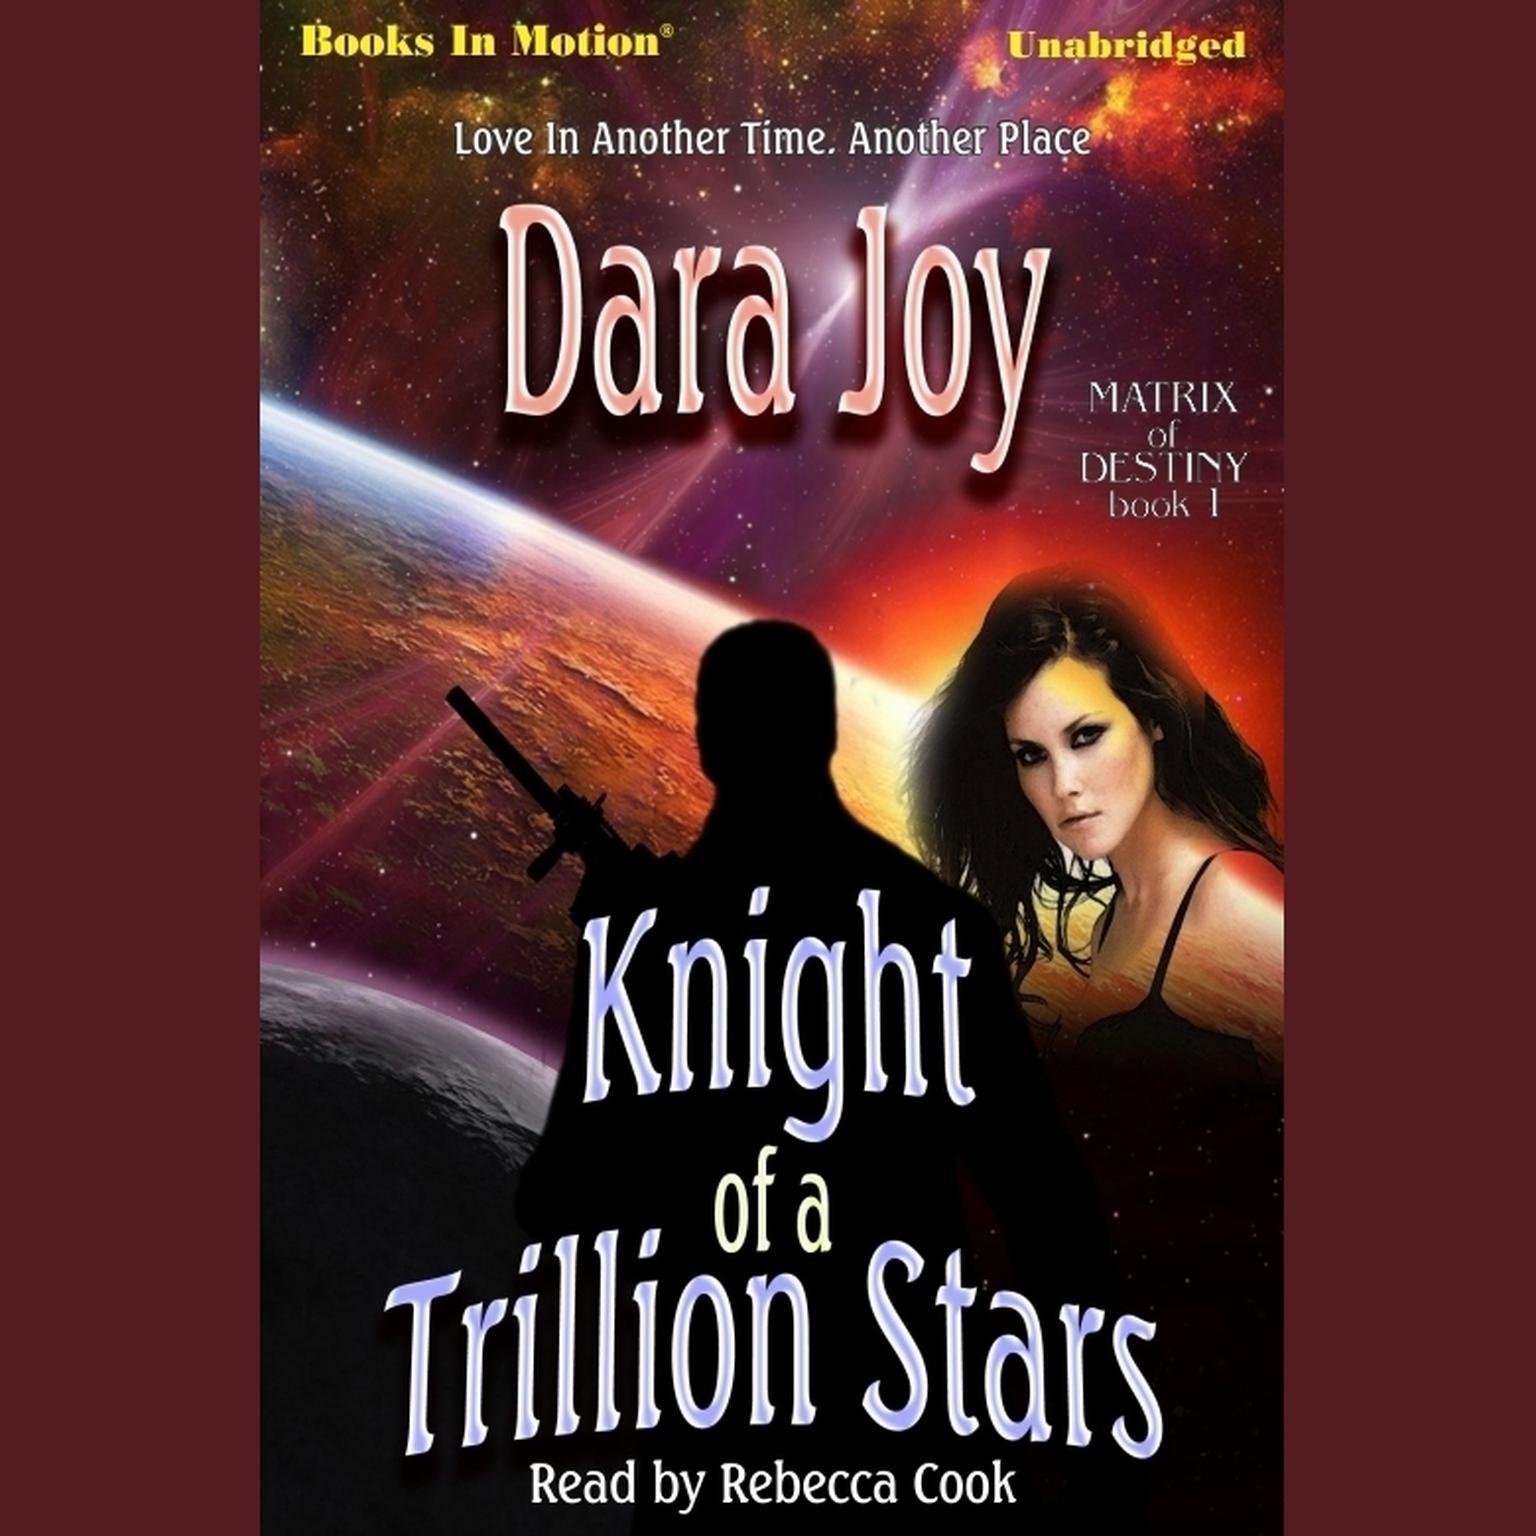 Knight of a Trillion Stars Audiobook, by Dara Joy